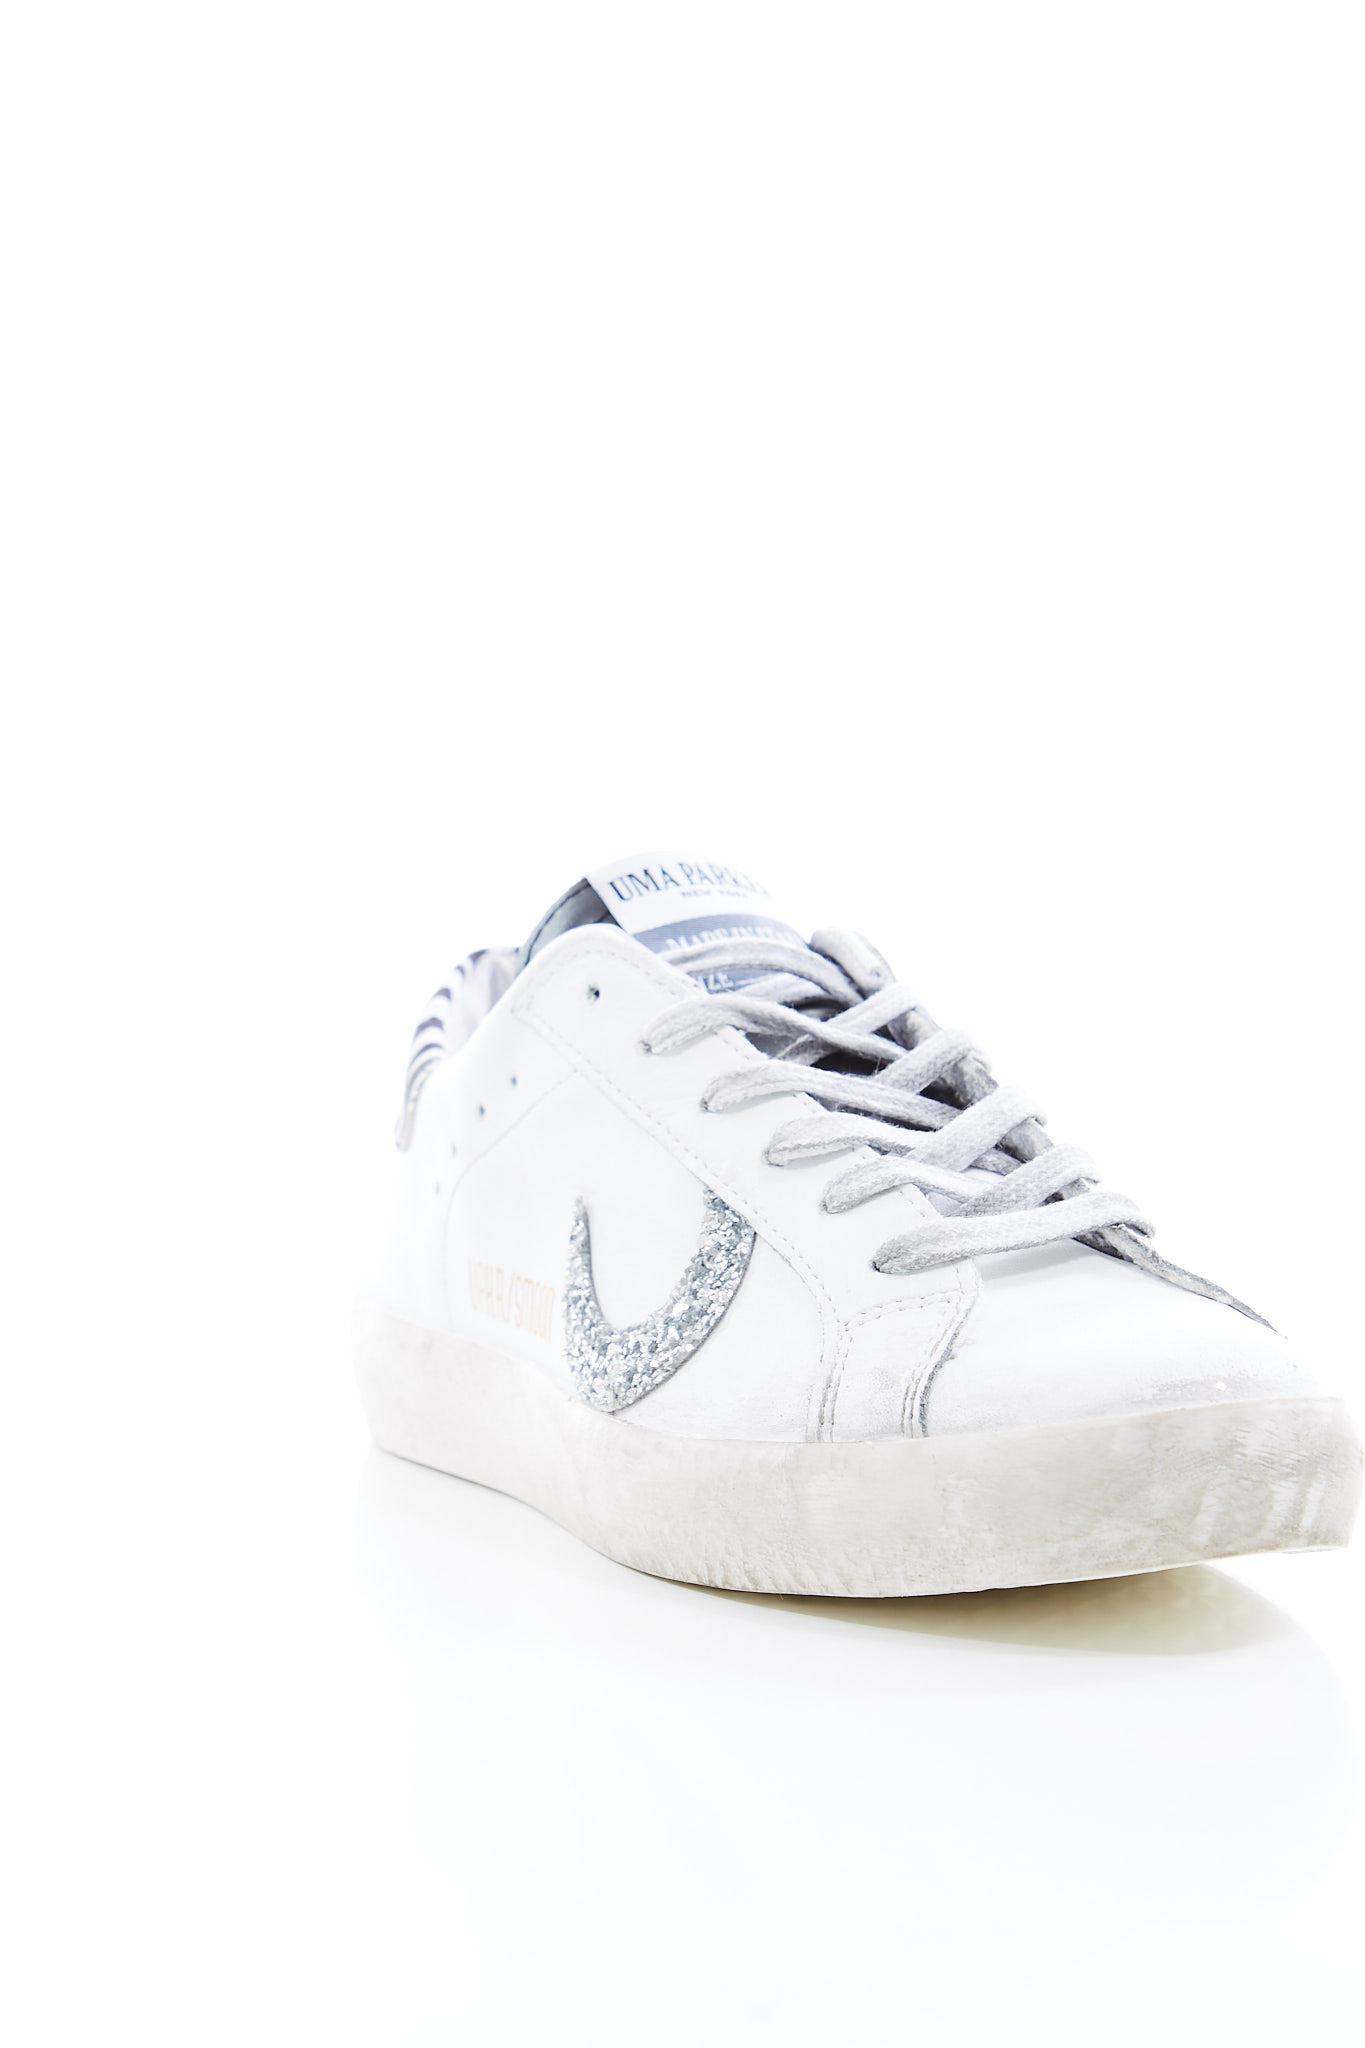 Sneakers basse in pelle UMA PARKER | Scarpe | SUPER MOONBIANCO/ZEBRA